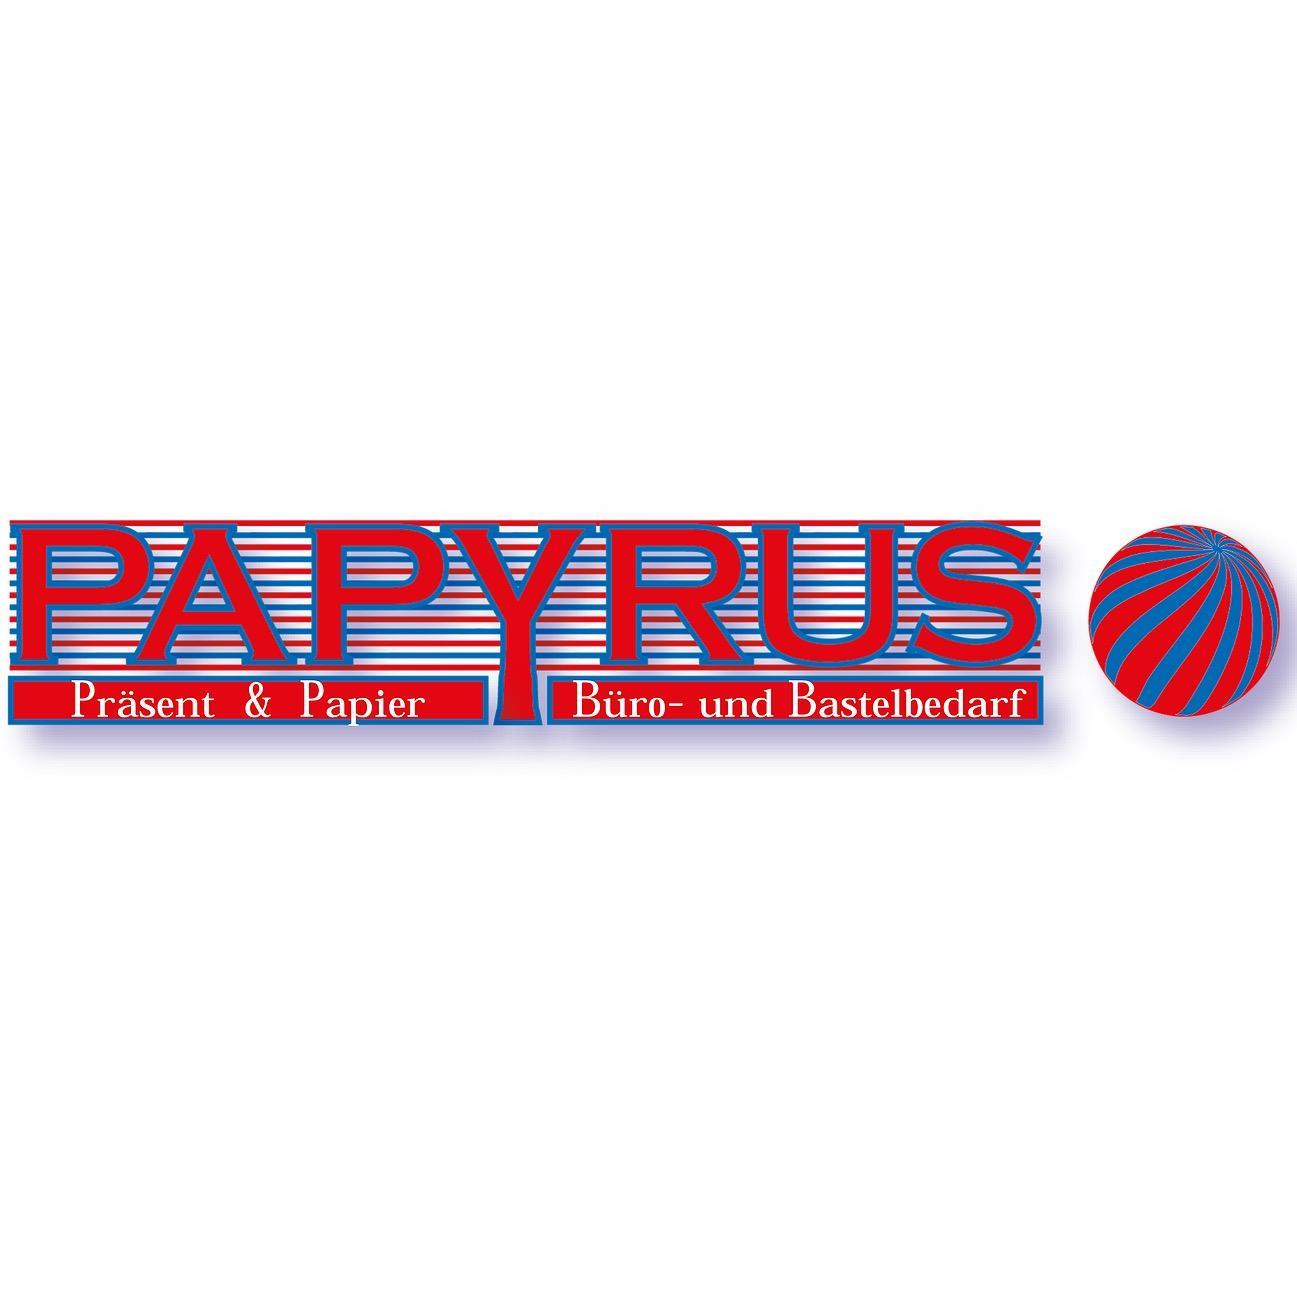 Papyrus Köln | Büro-, Bastelbedarf & Schreibwaren in Köln